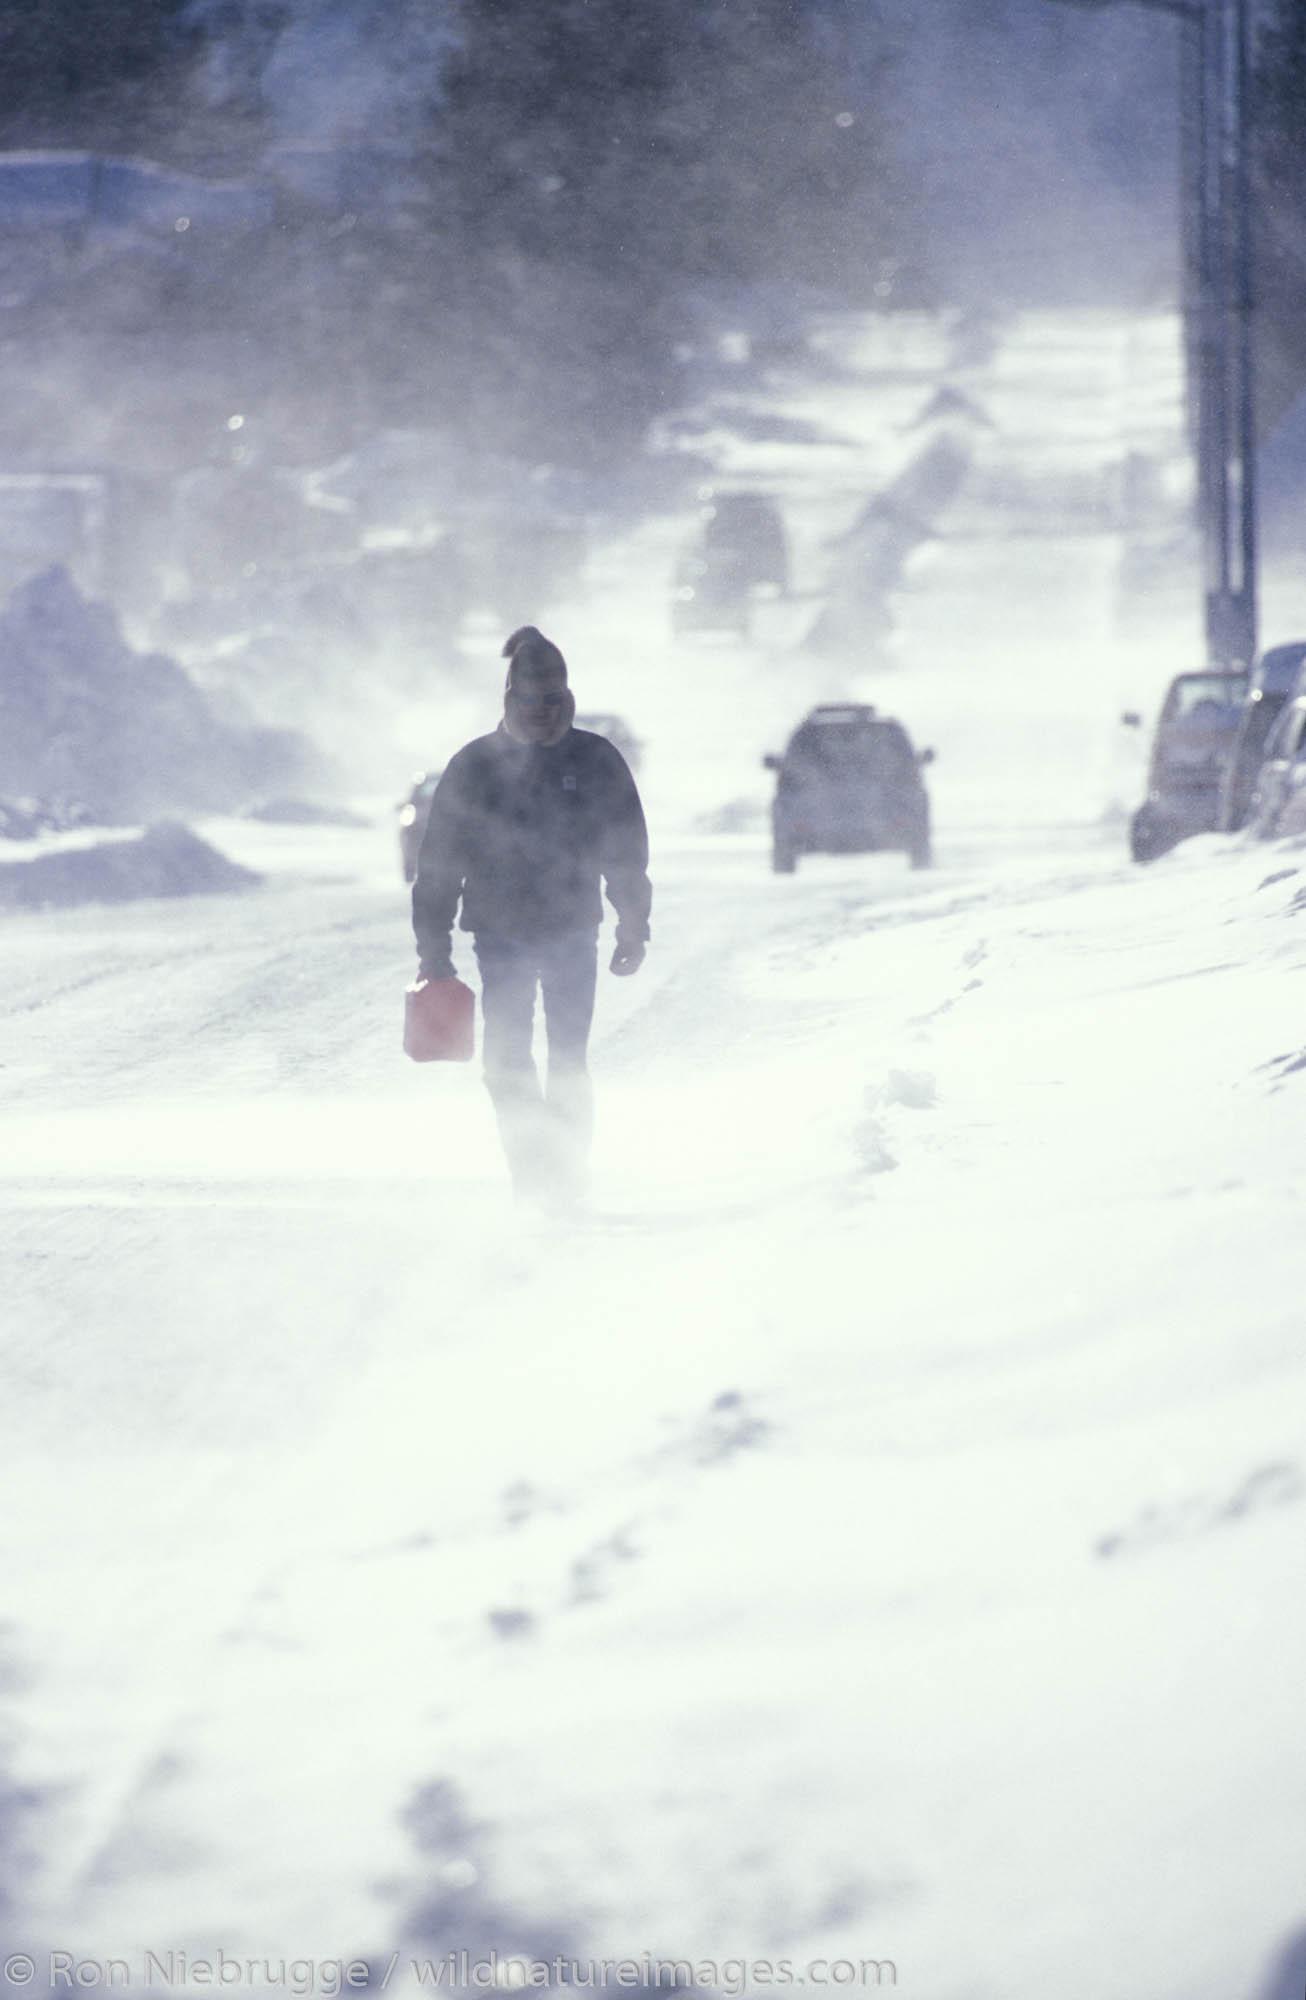 Man carrying a fuel can in a winter storm, Seward, Alaska.